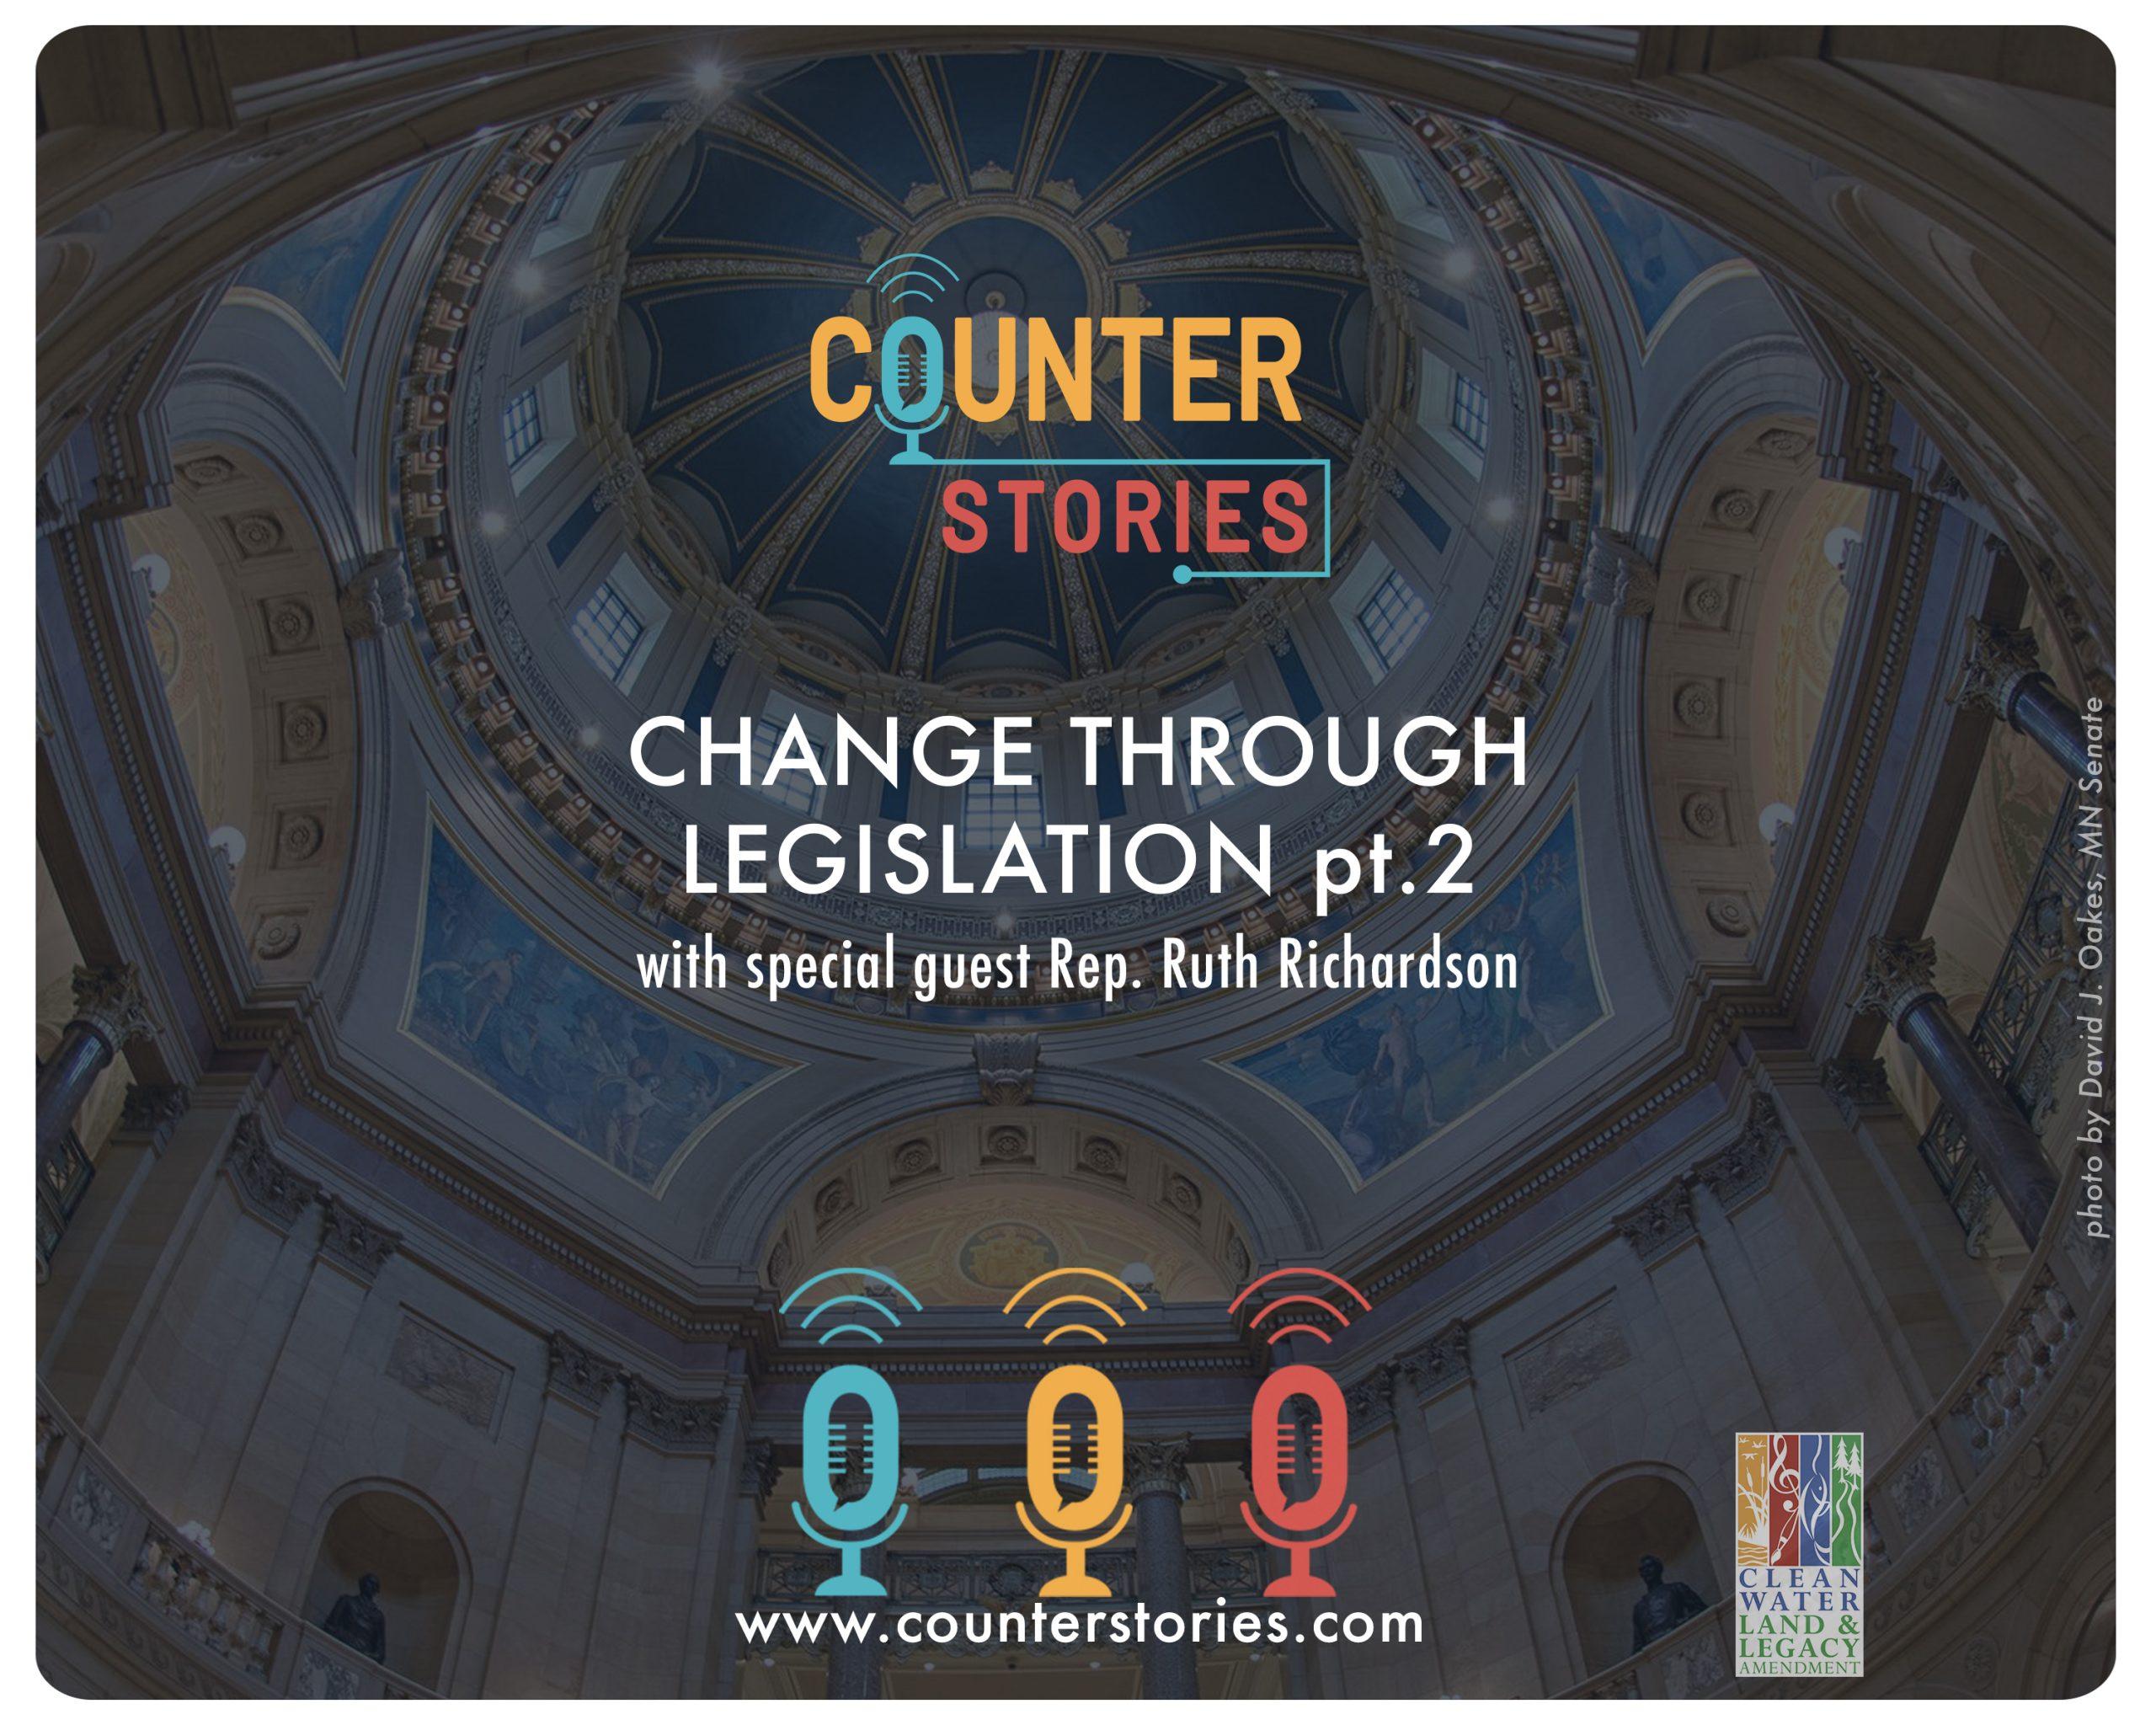 Change through Legislation pt. 2